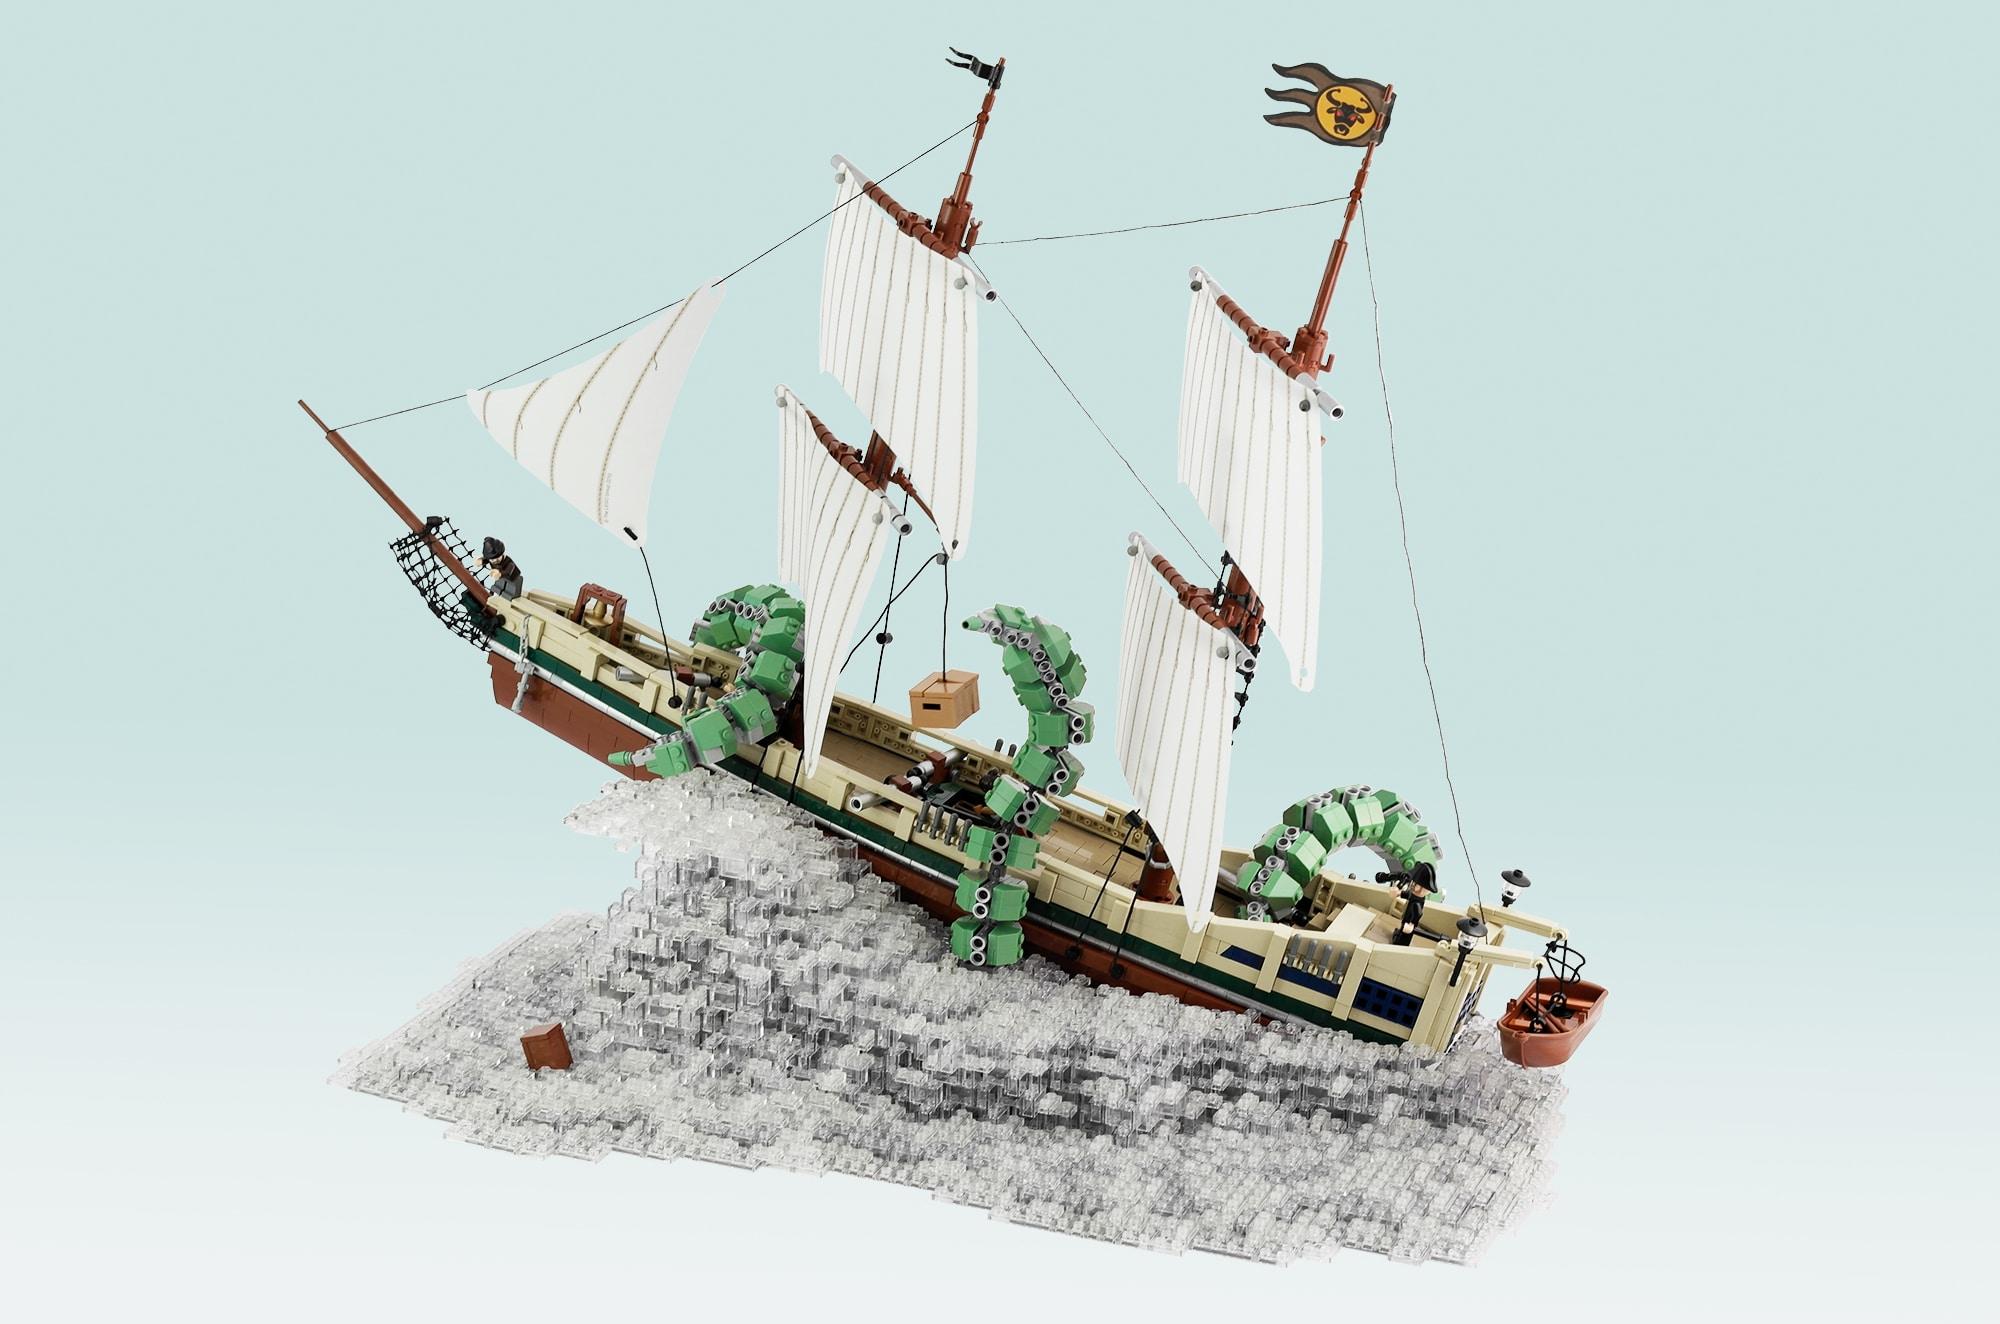 LEGO Moc Iron Builder 2016 Schiff Kraken